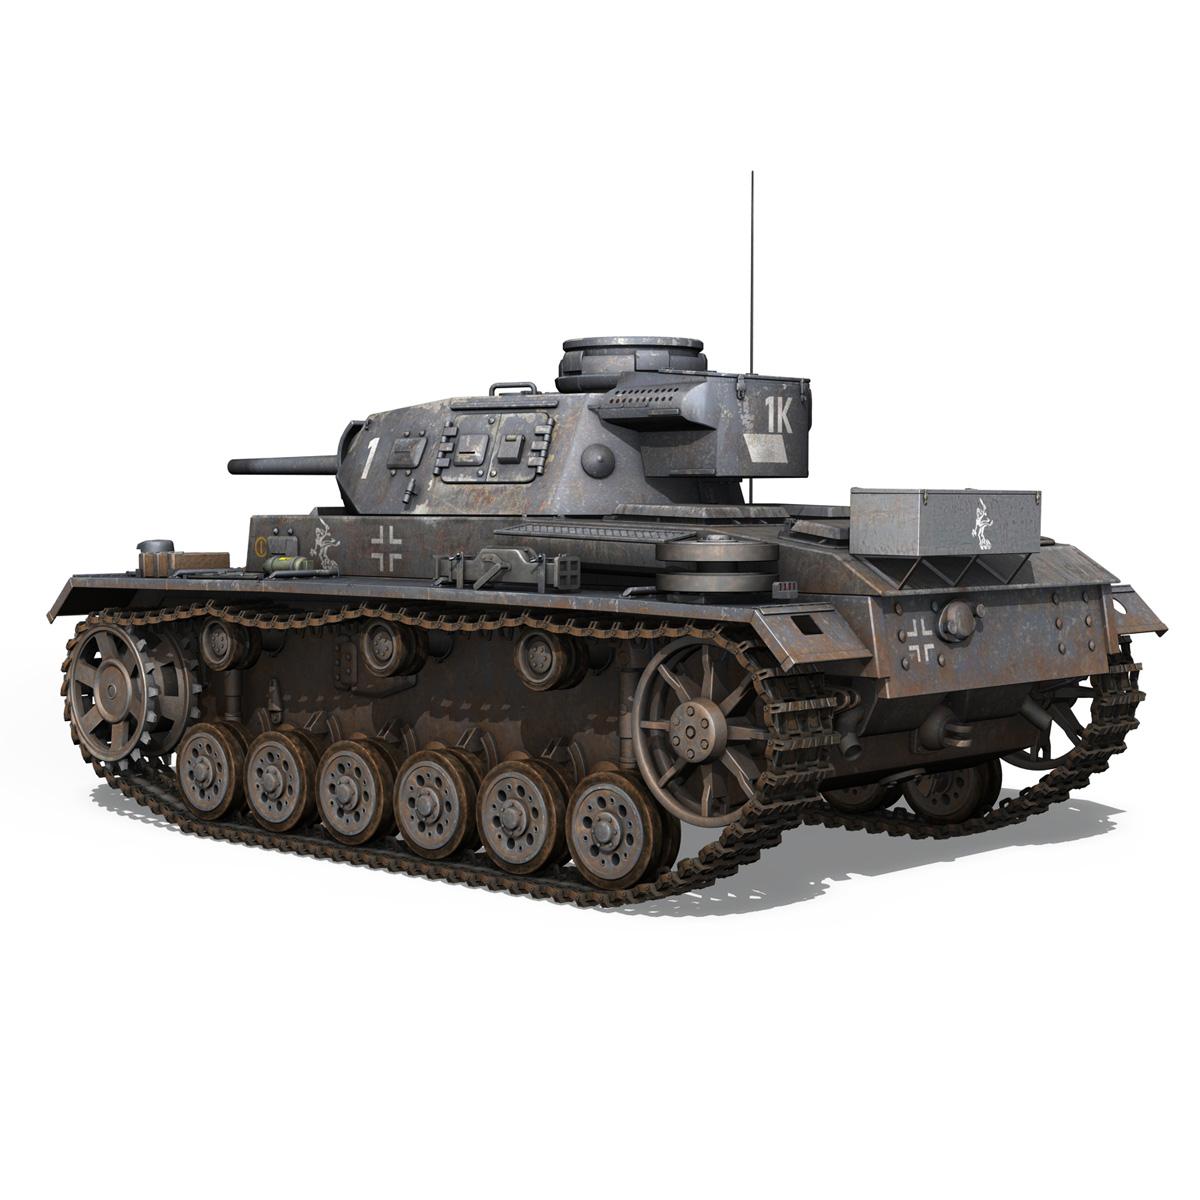 pzkpfw iii – panzer 3 – ausf.j – 1k 3d model lwo lw lws obj c4d 3ds fbx 266447